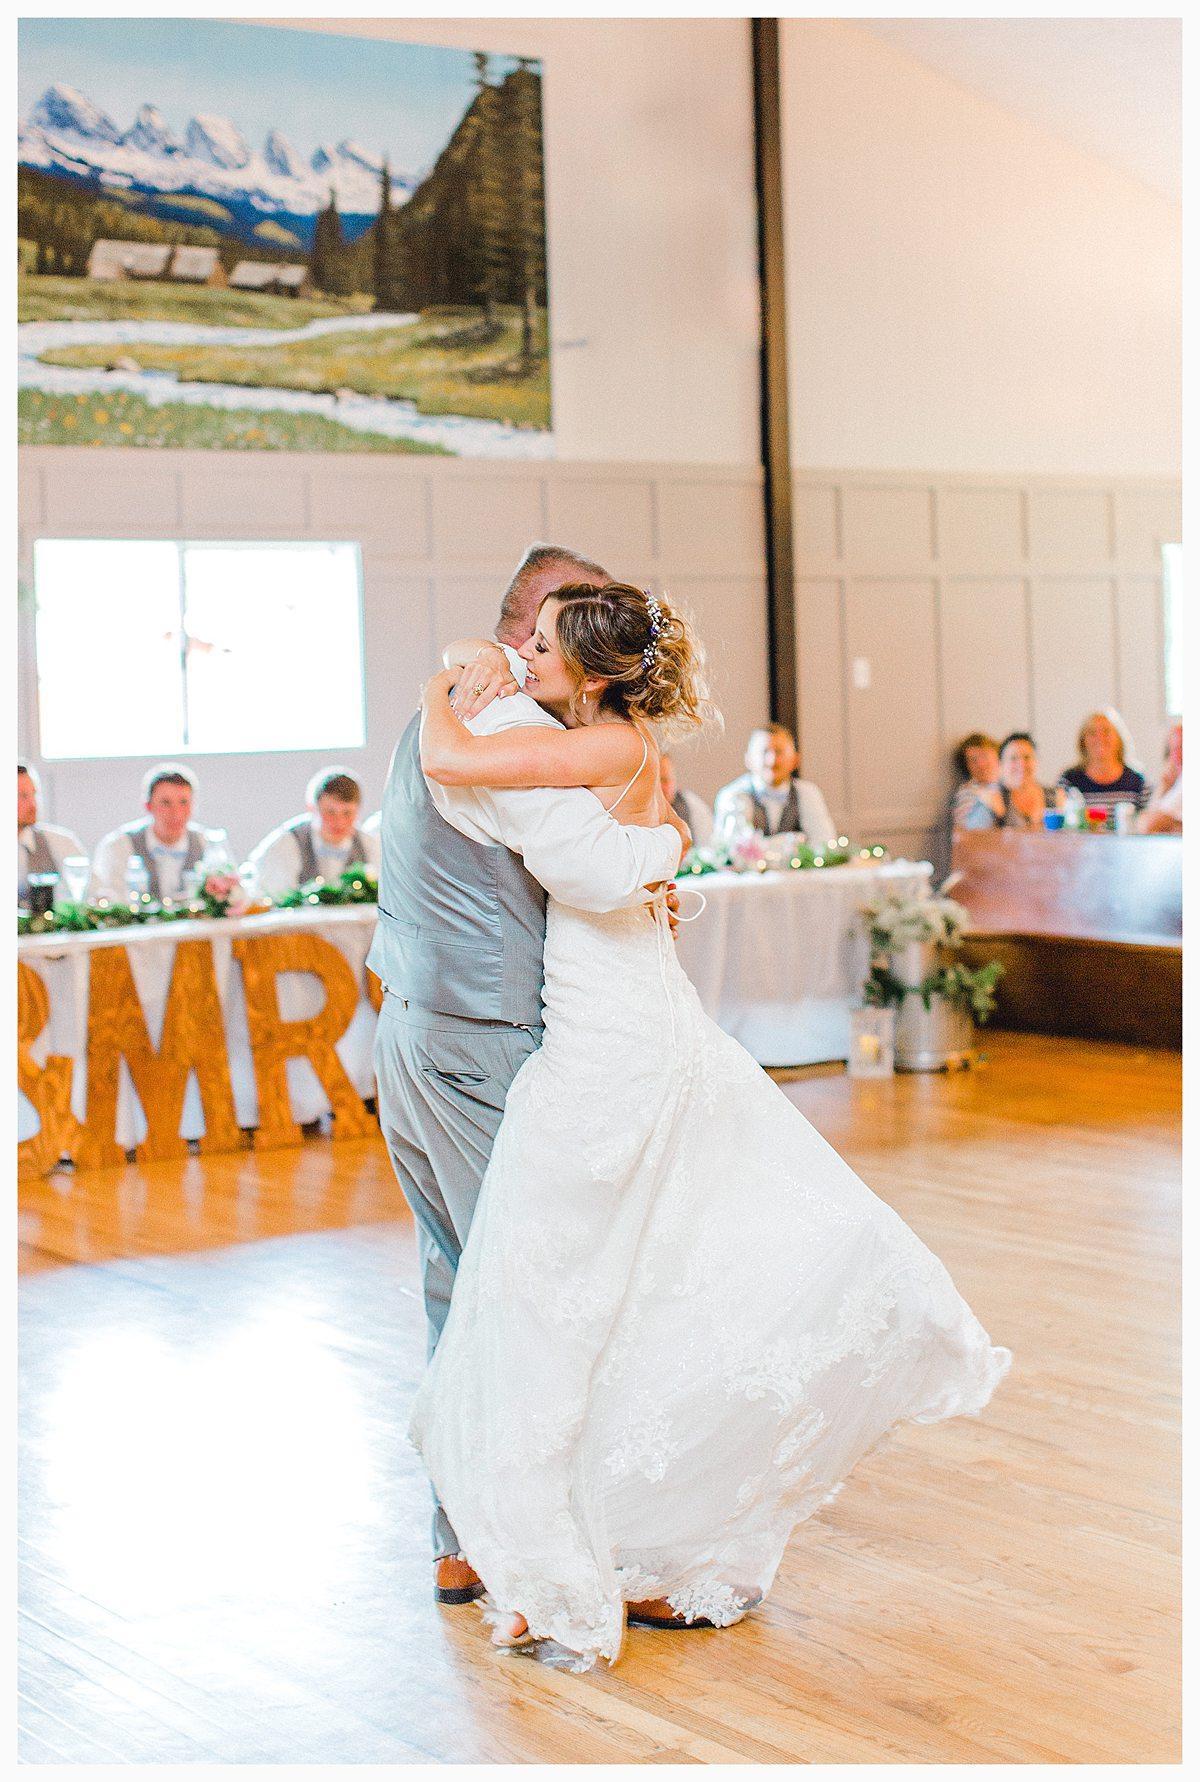 Rustic Coastal Blue Wedding in Southwest Washington, Emma Rose Company, Seattle and Portland Wedding Photographer, Light and Airy_0144.jpg